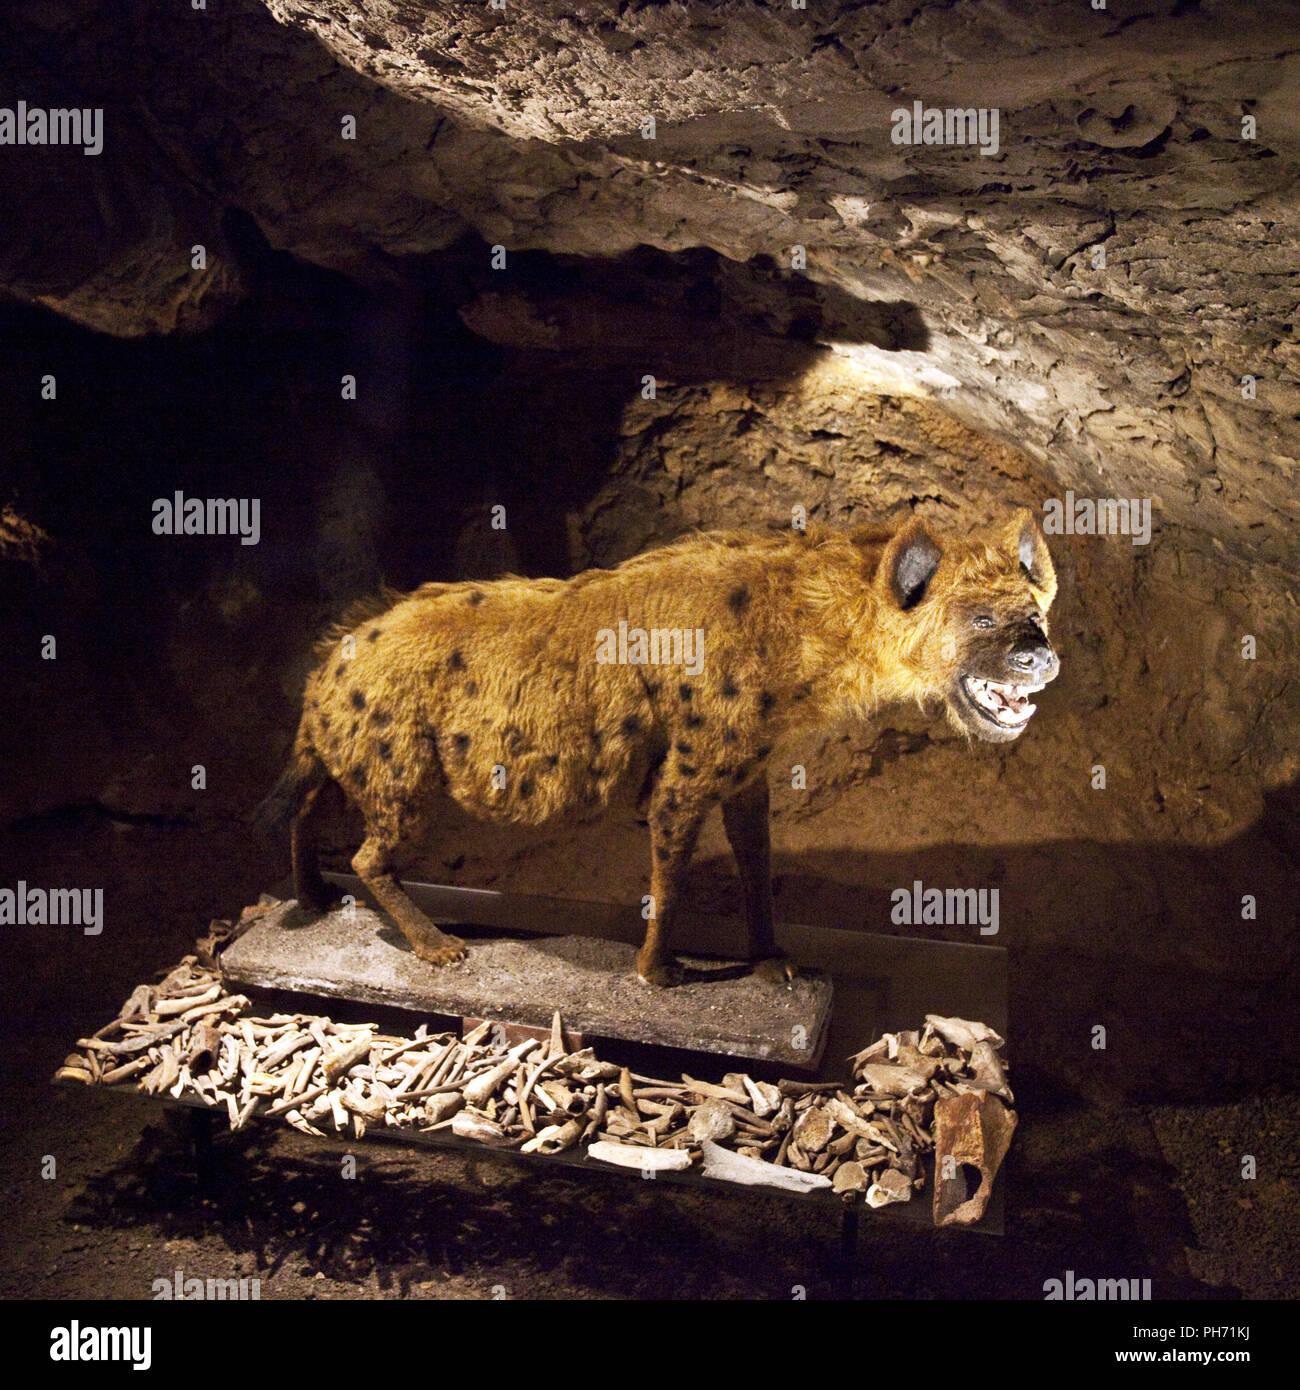 Henrich cave Hemer, North Rhine-Westphalia,Germany - Stock Image